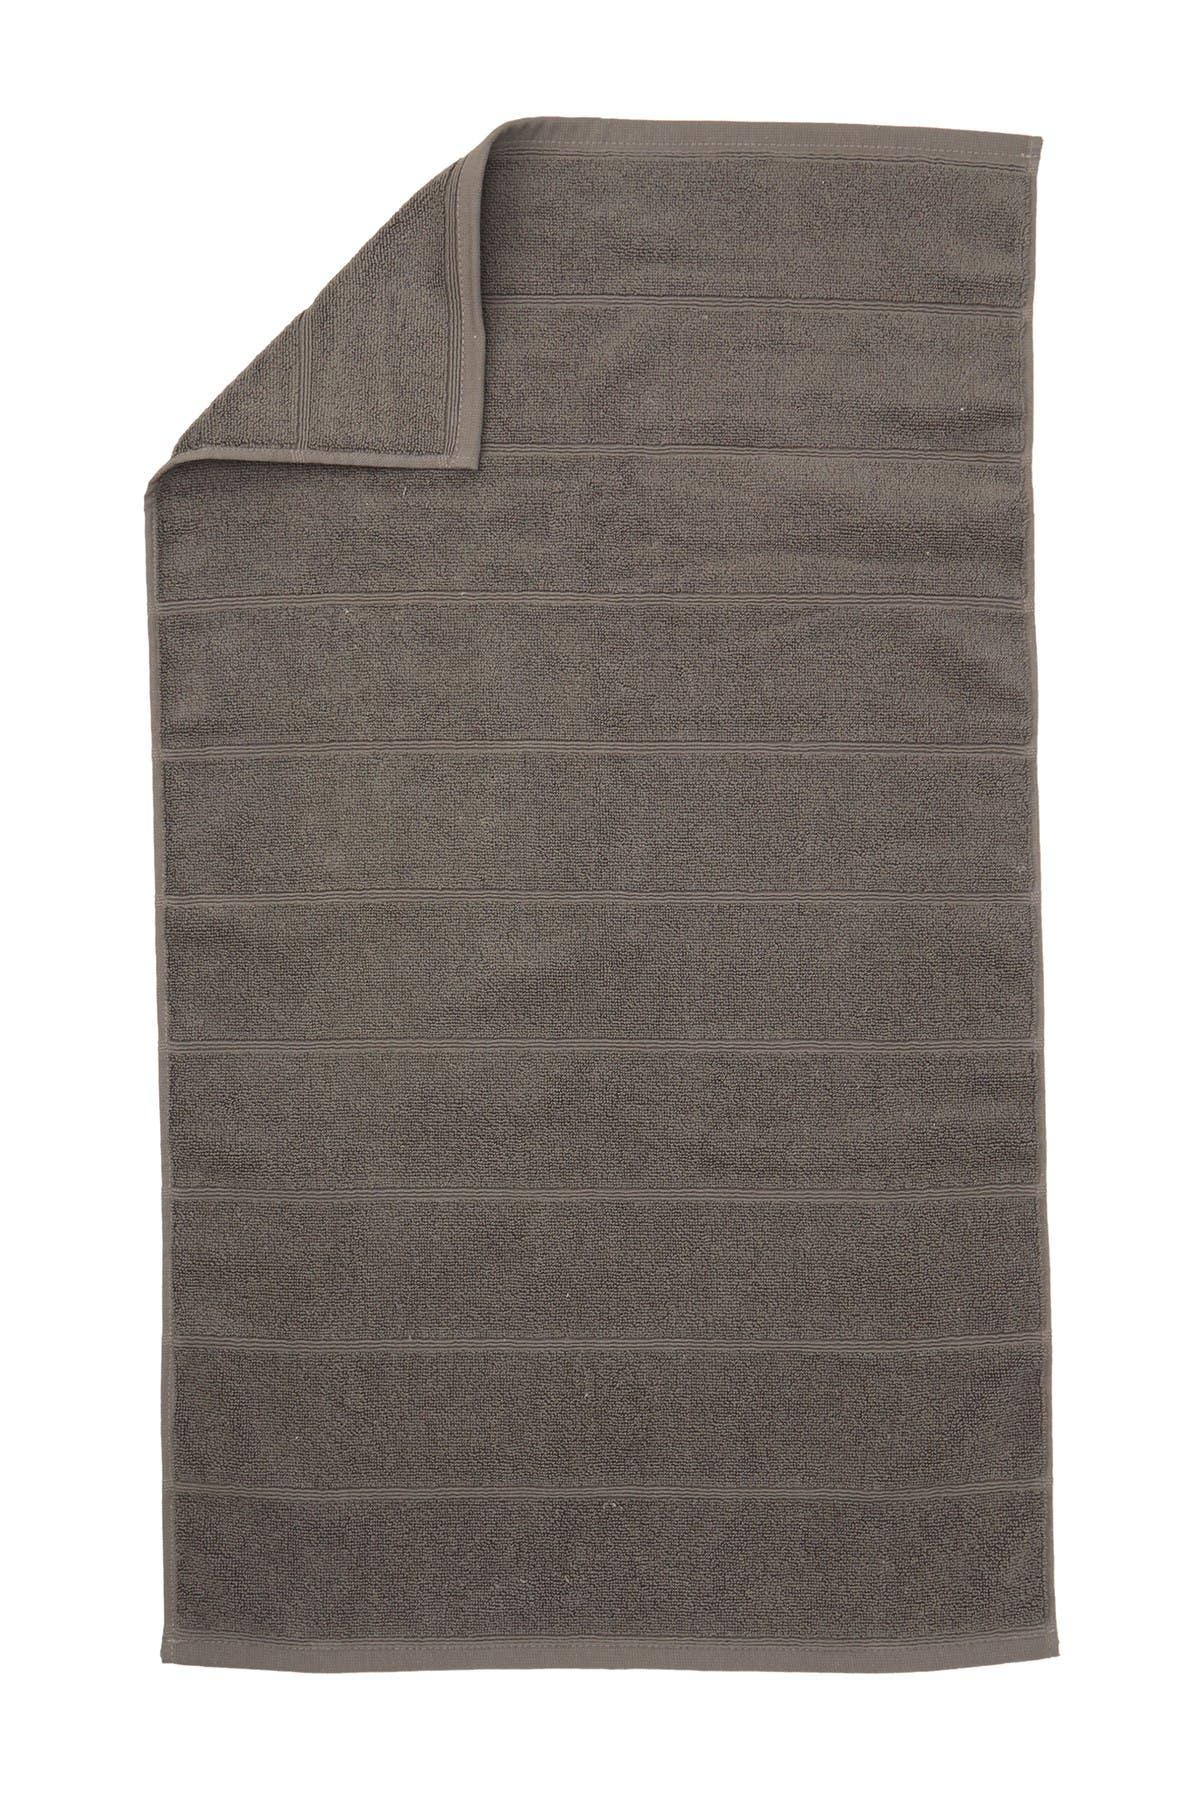 Image of Nordstrom Rack Cotton Tub Mat